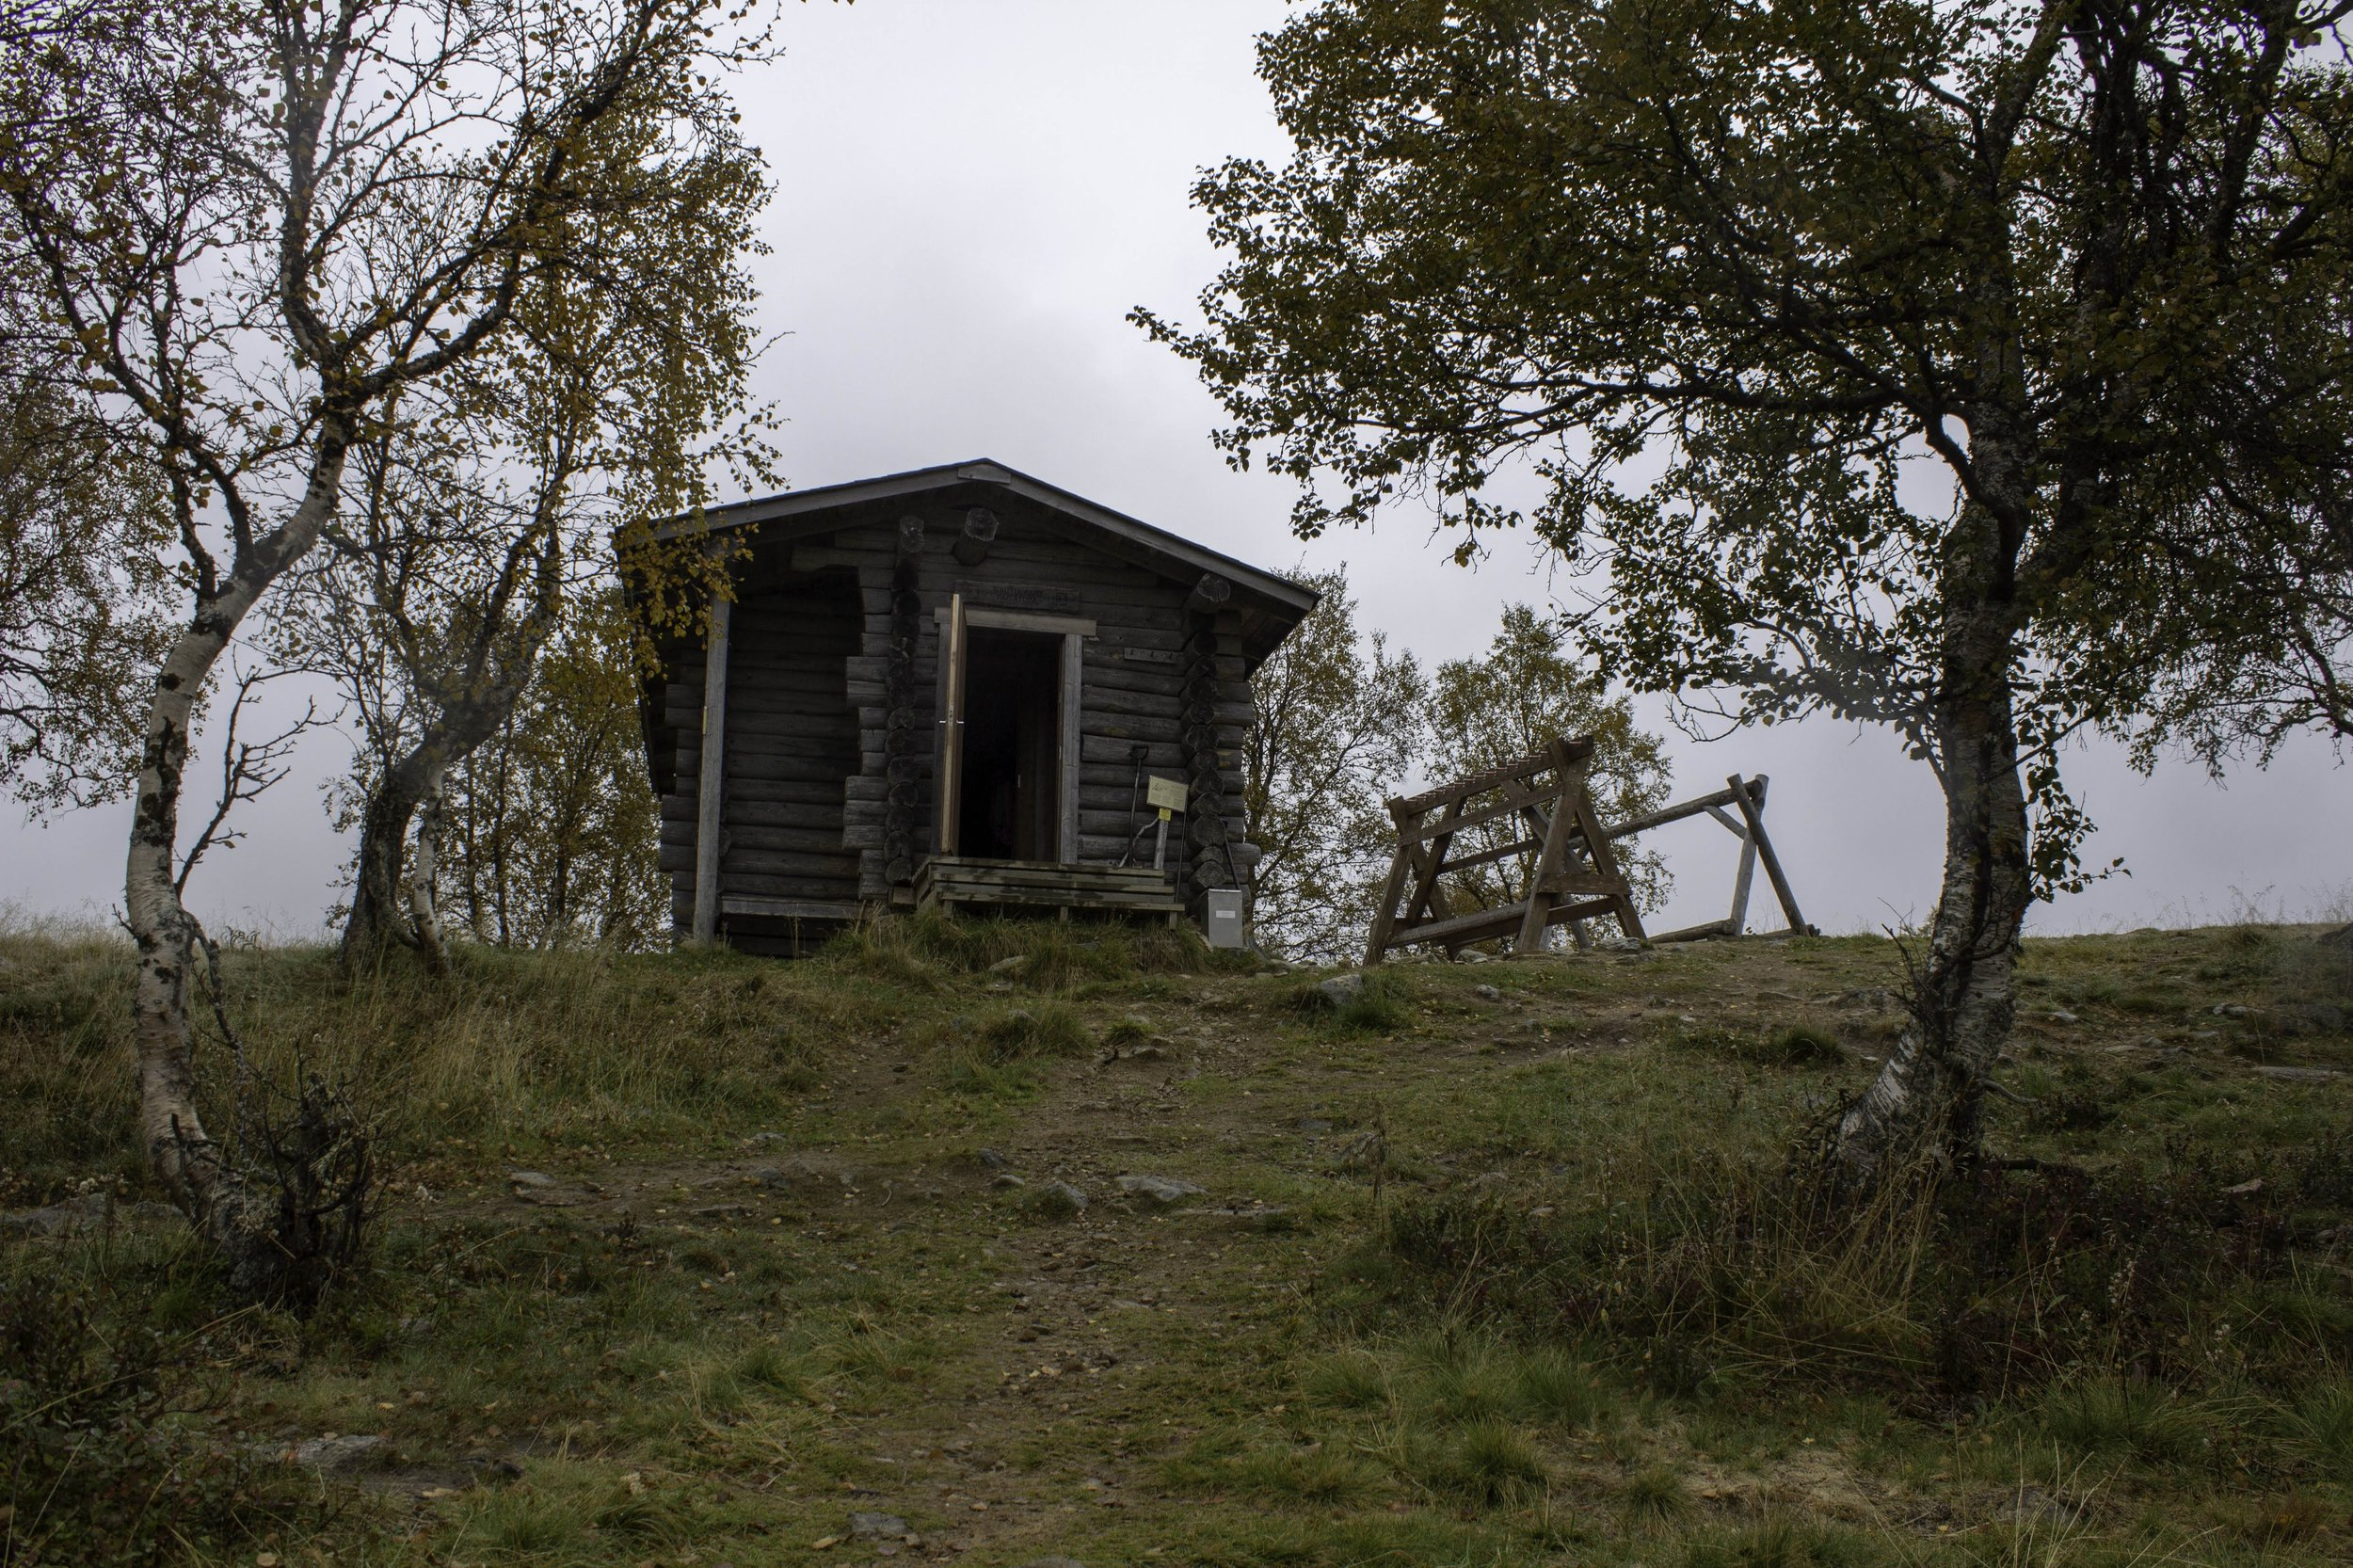 Hiking photos by Irina S-61 (1).jpg